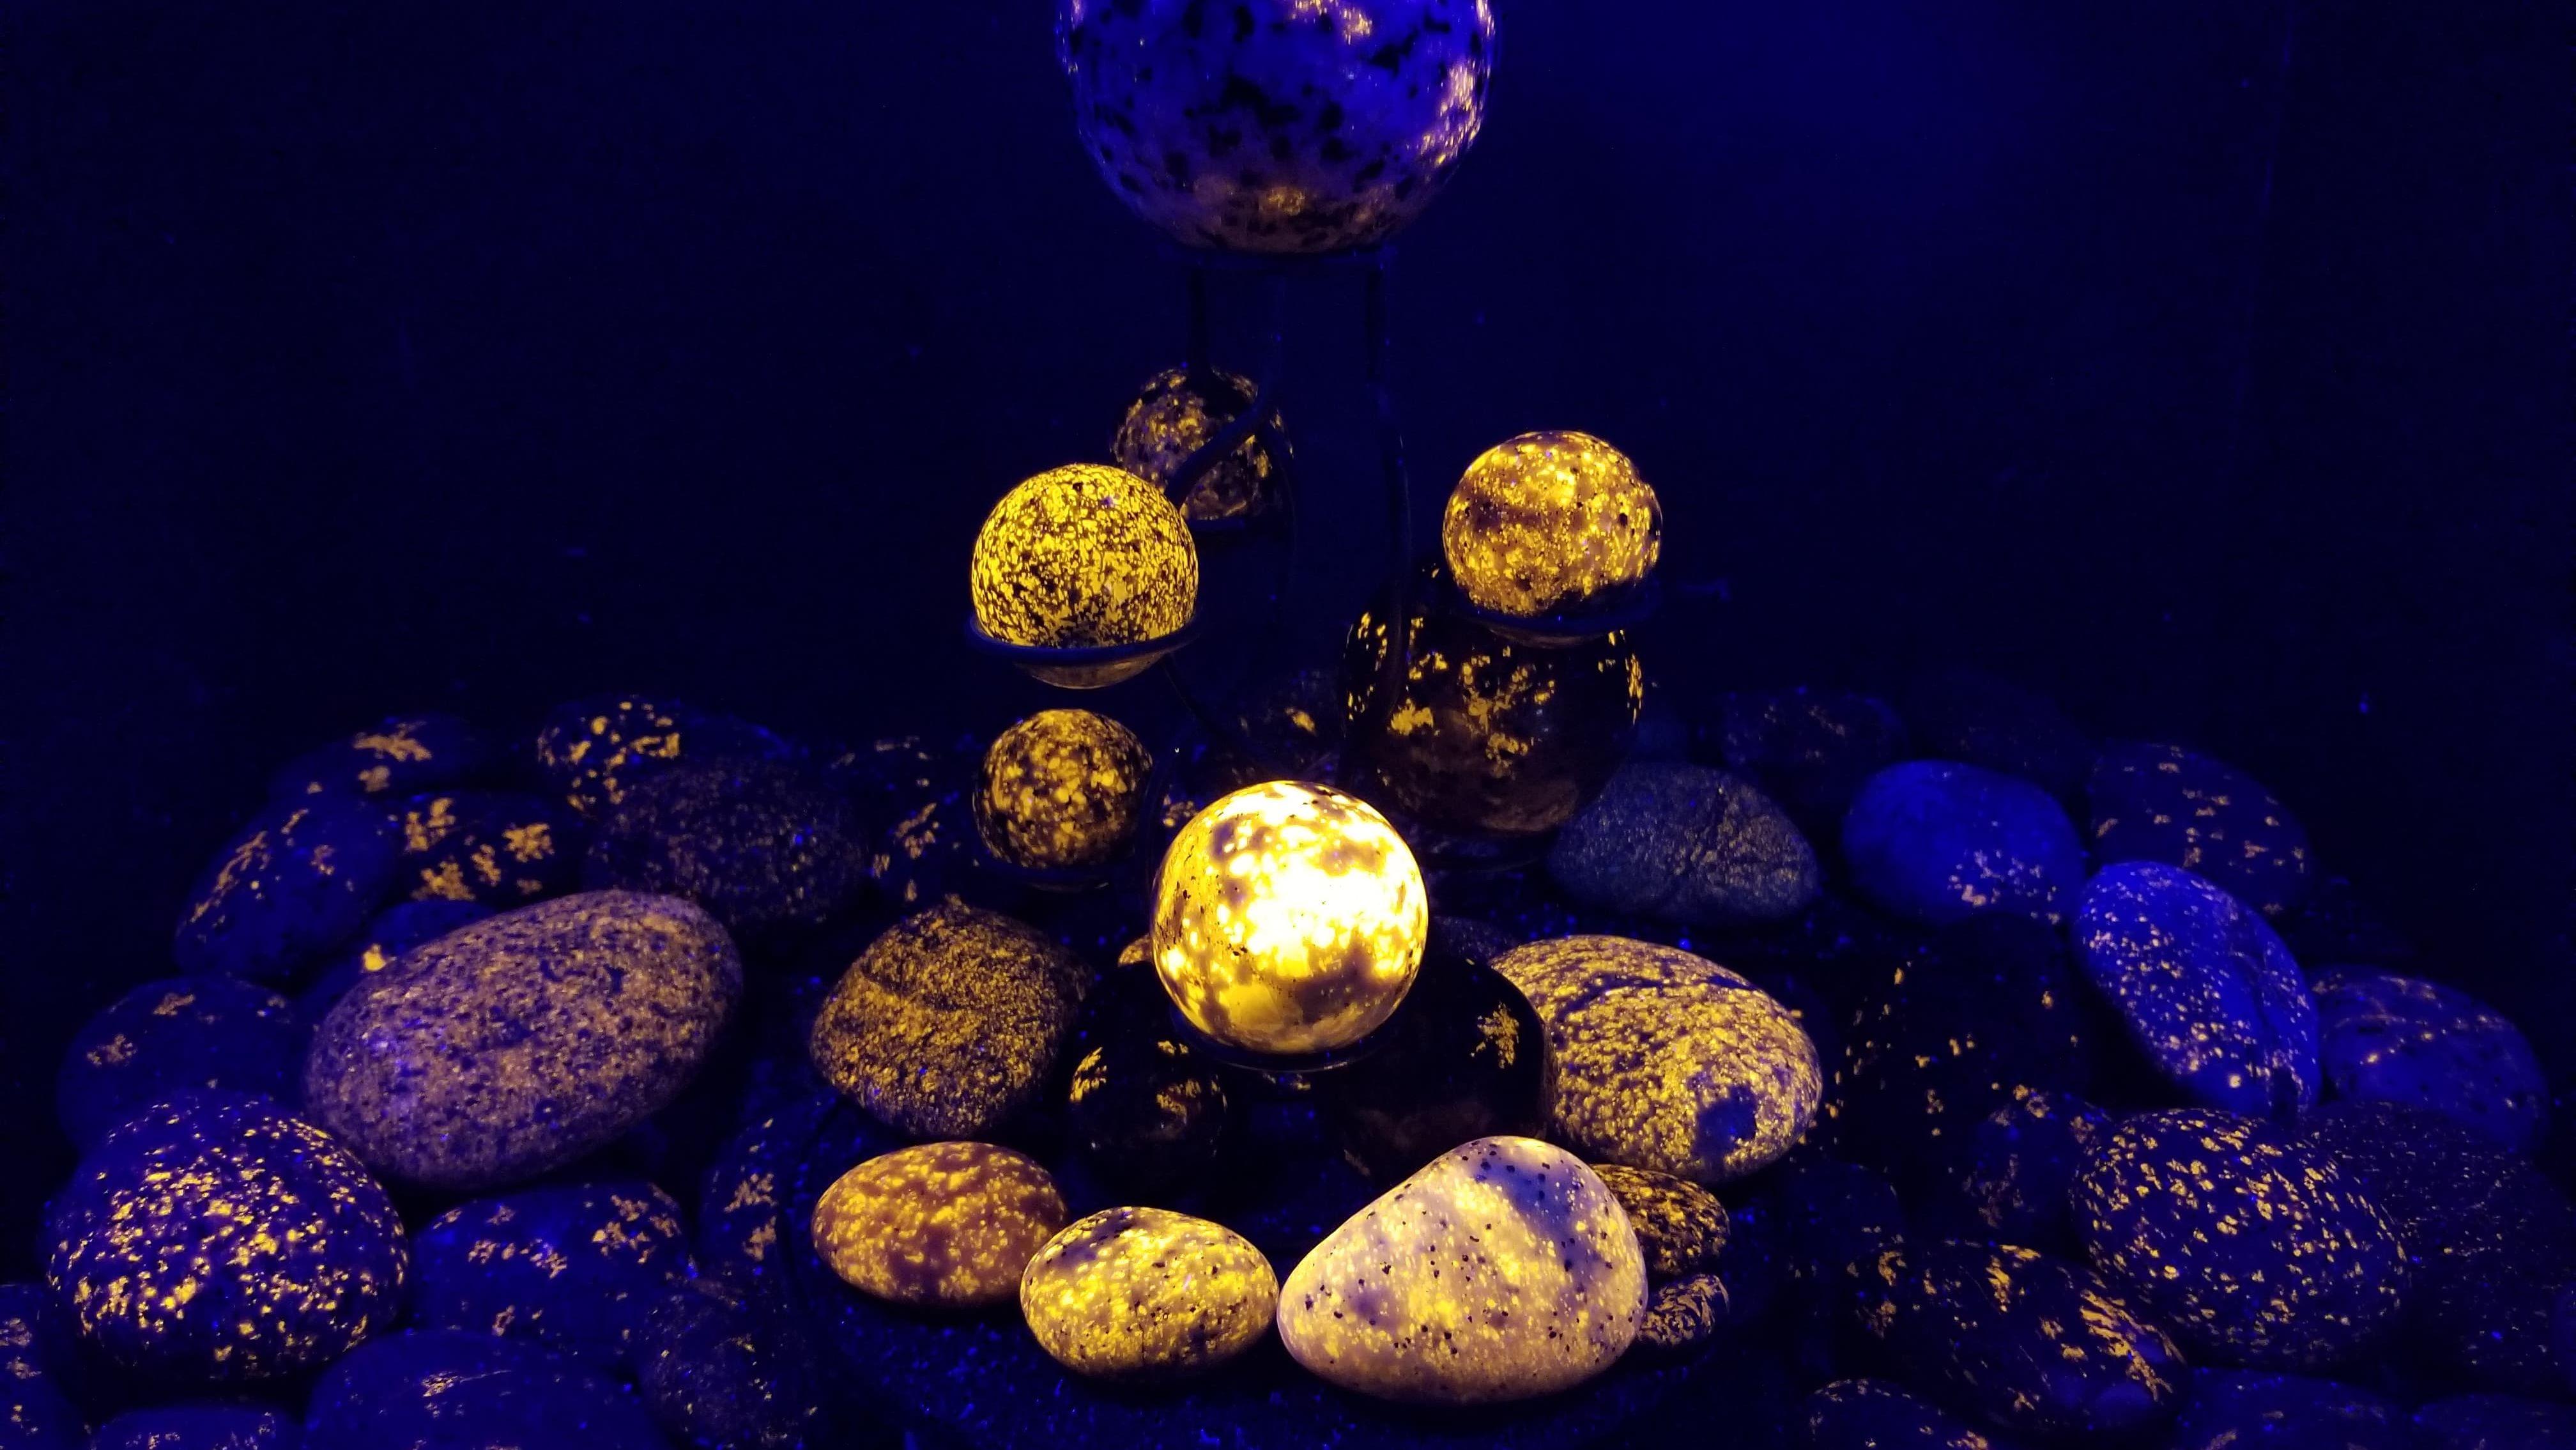 Michigan Rock Hunter Discovers Glowing 'Yooperlites' on Lake Superior Beach